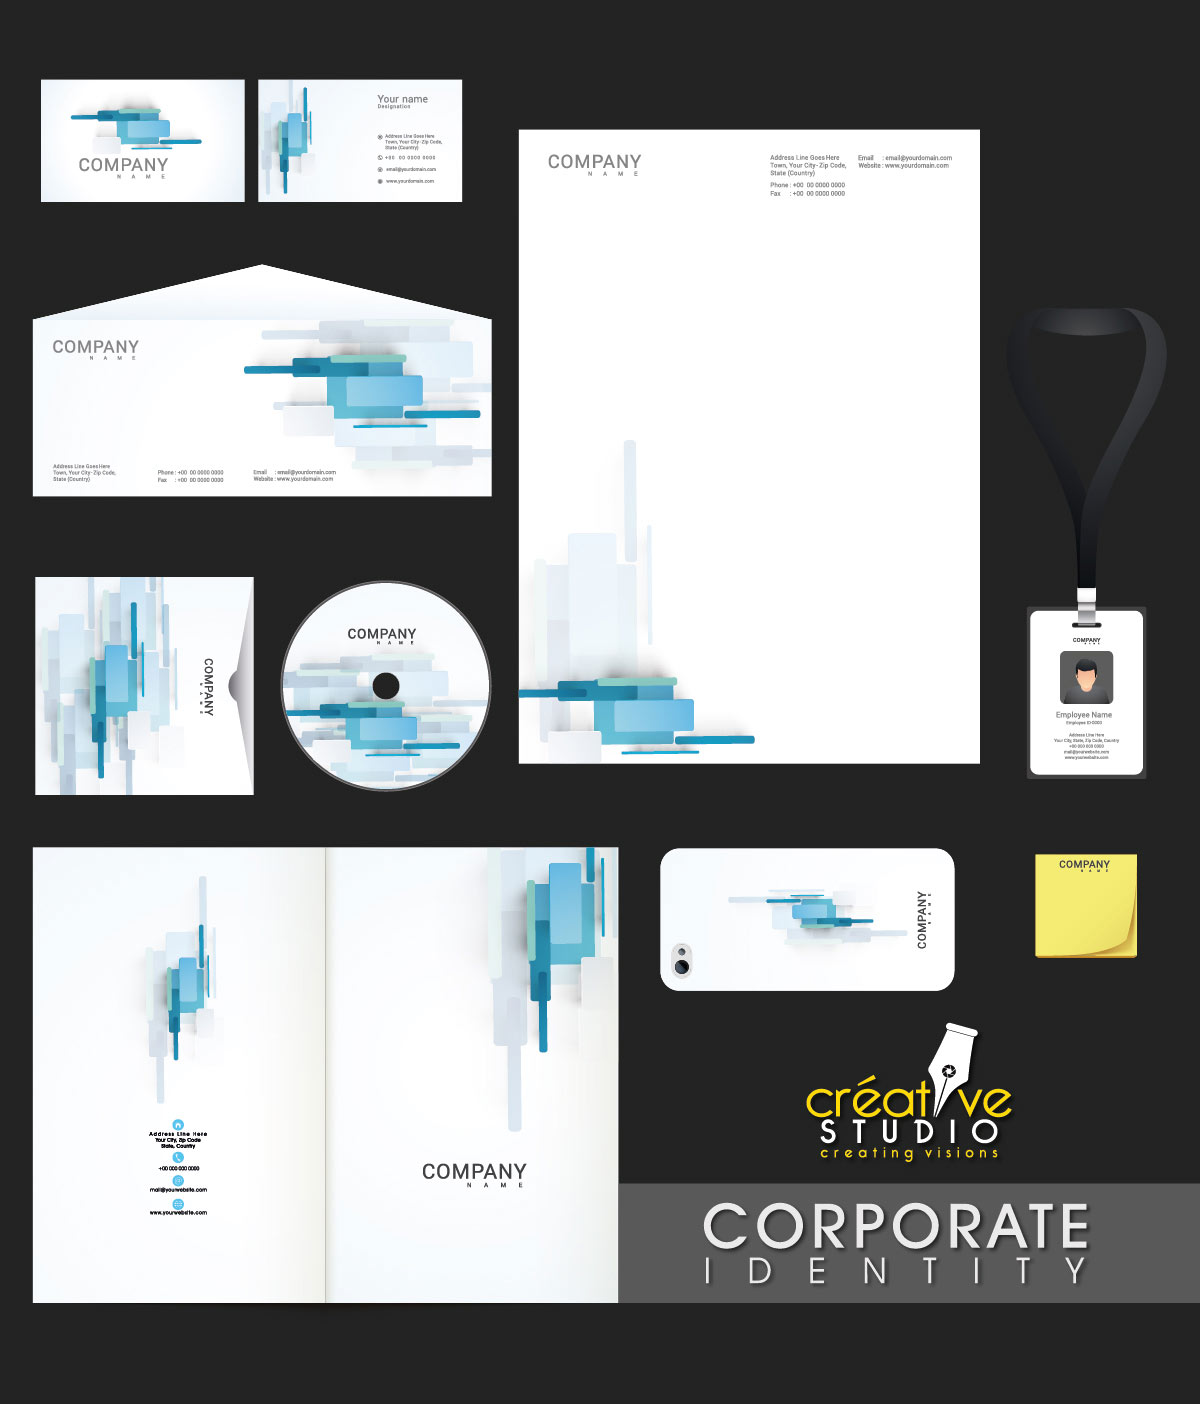 Corporate Identity 3 - Corporate Identity